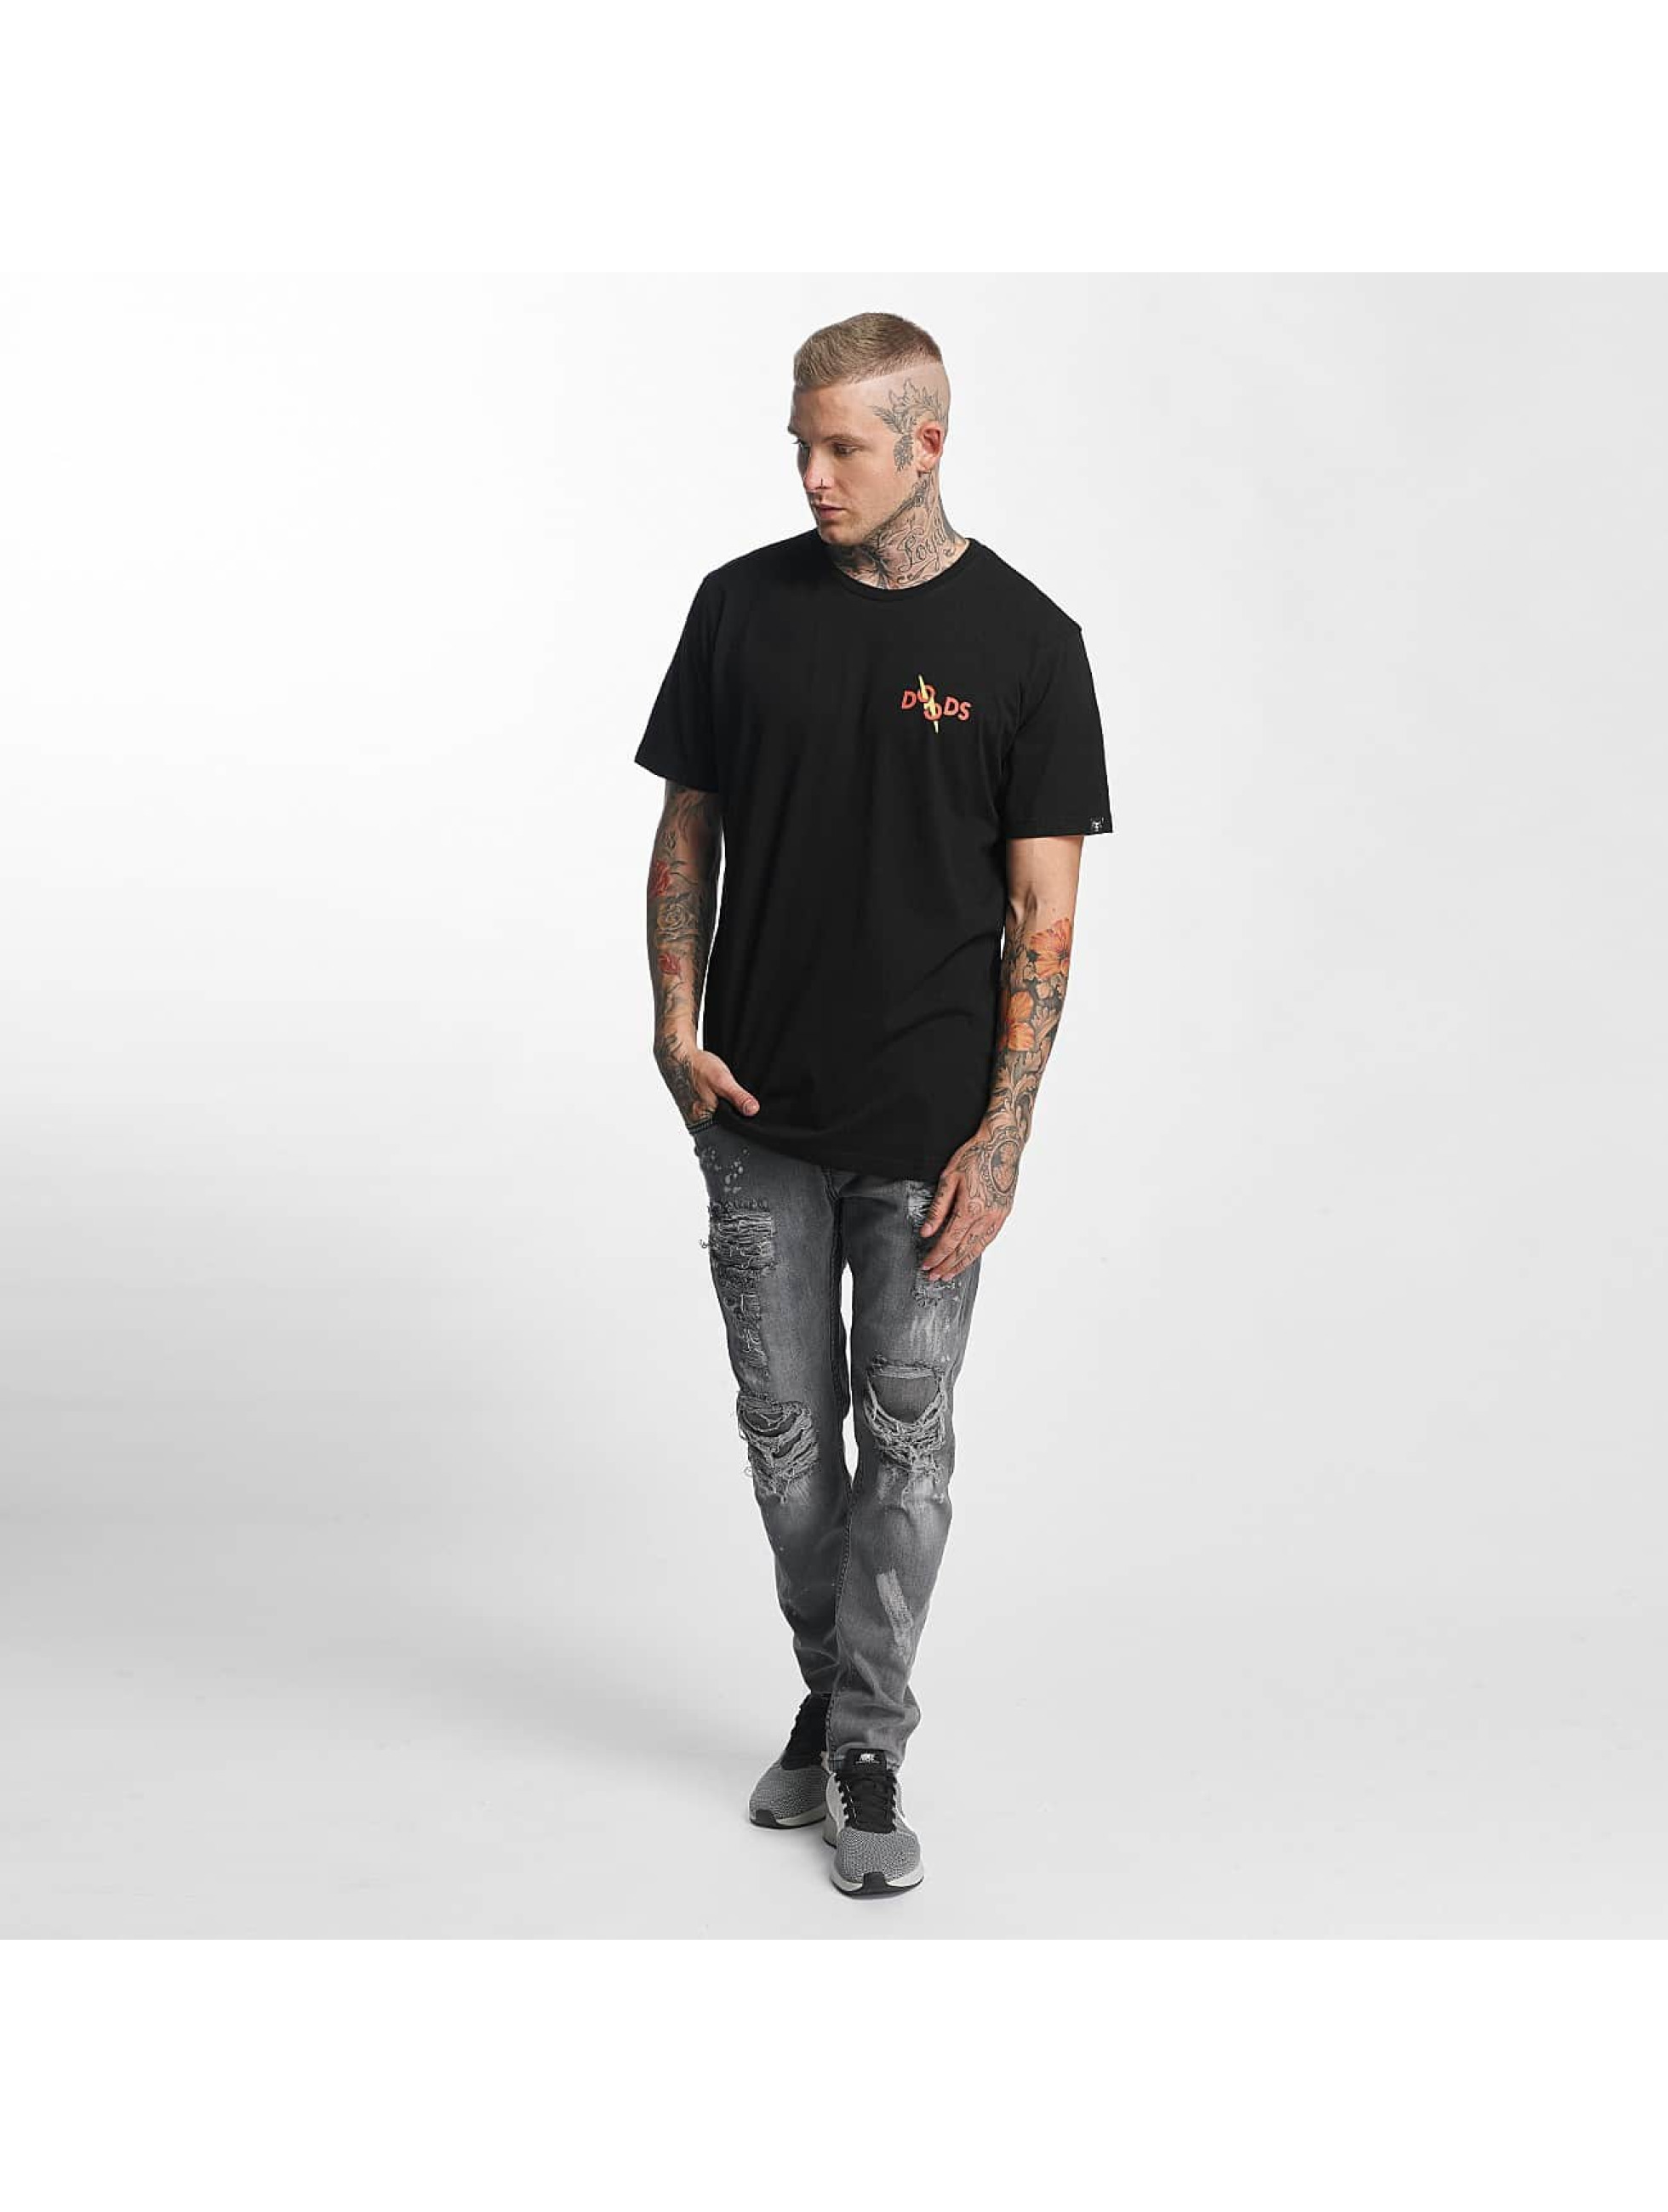 The Dudes T-Shirt Chili Cheese black